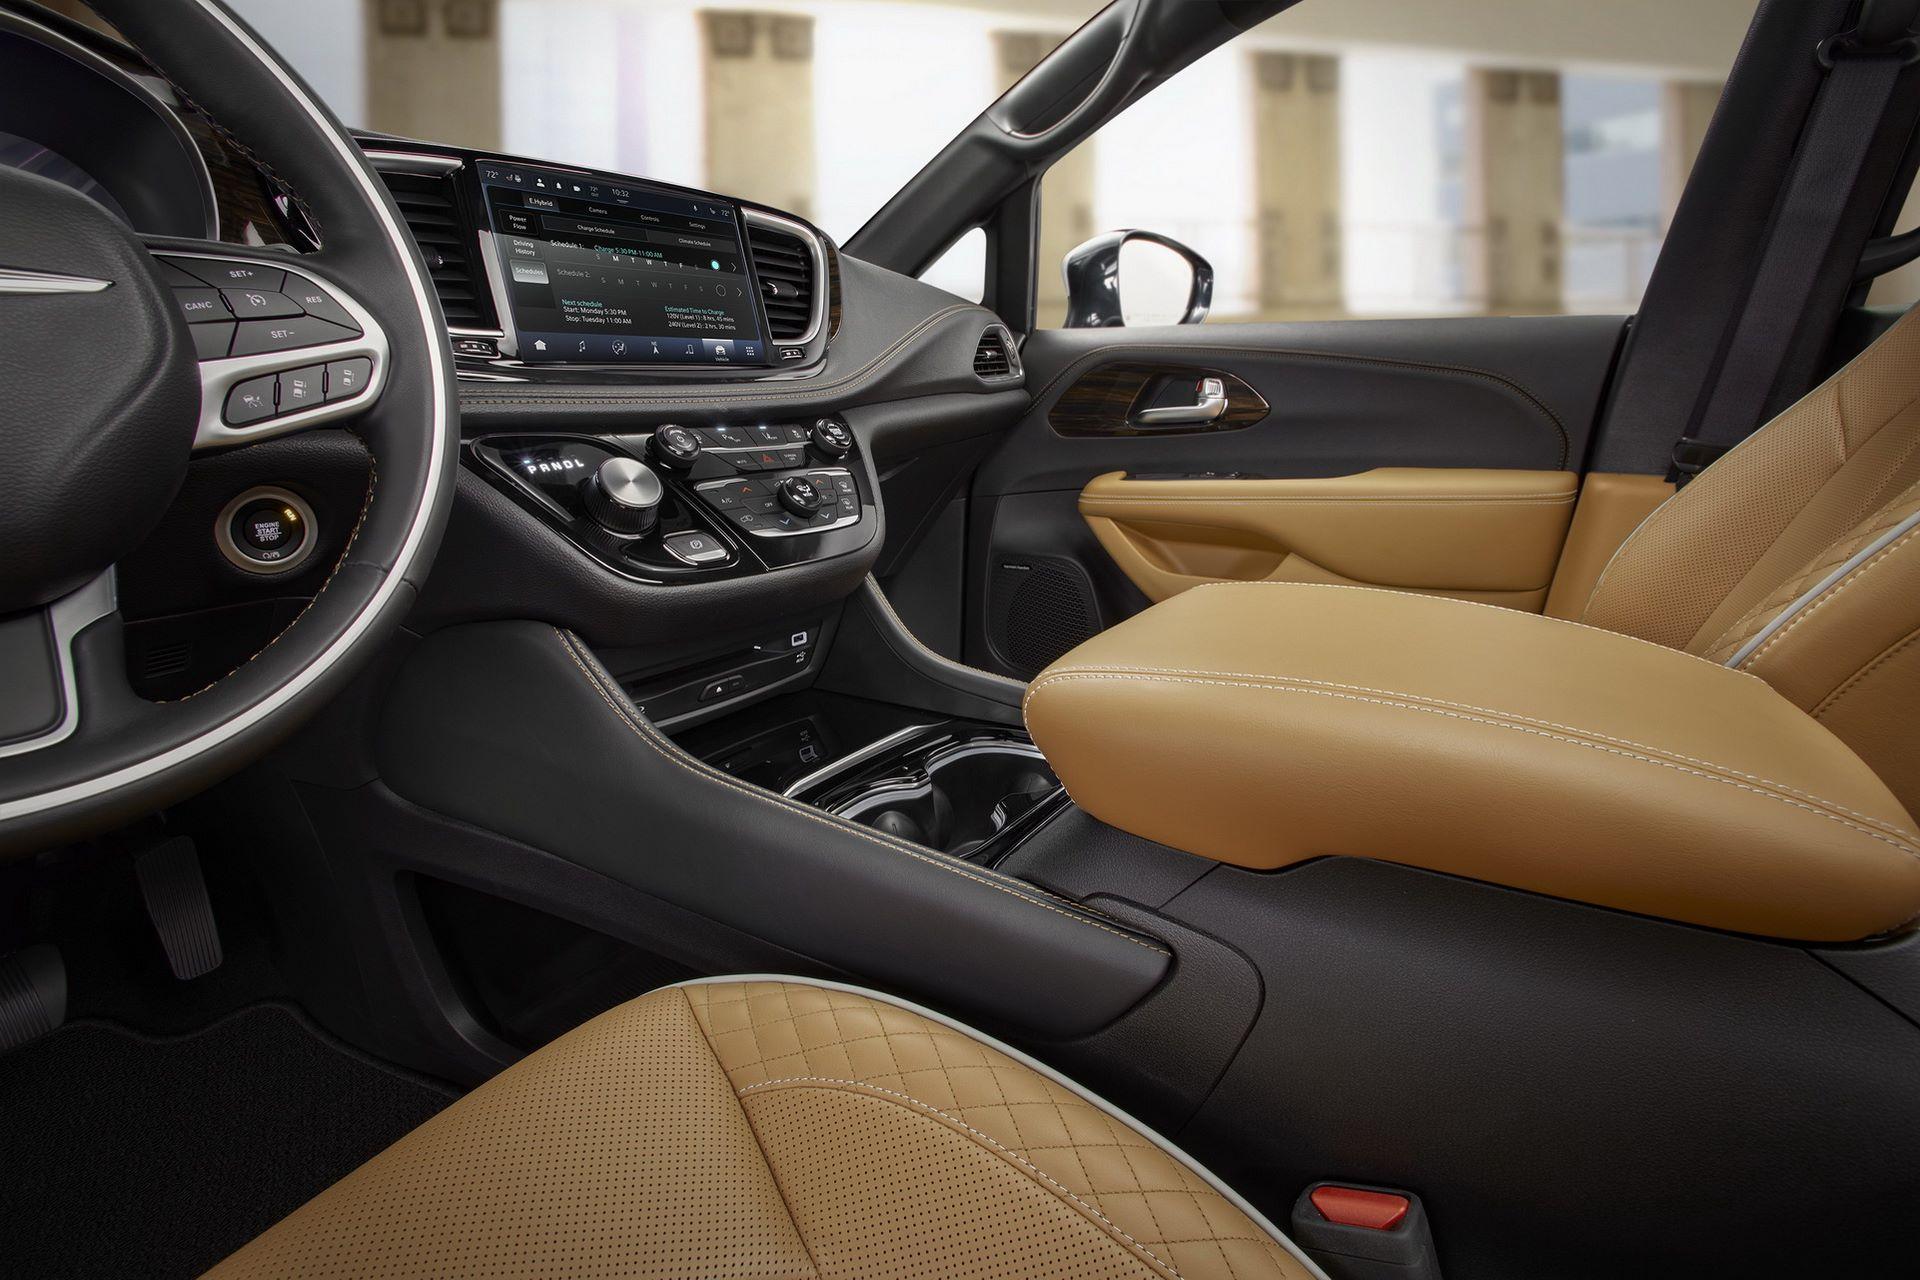 2021-Chrysler-Pacifica-73